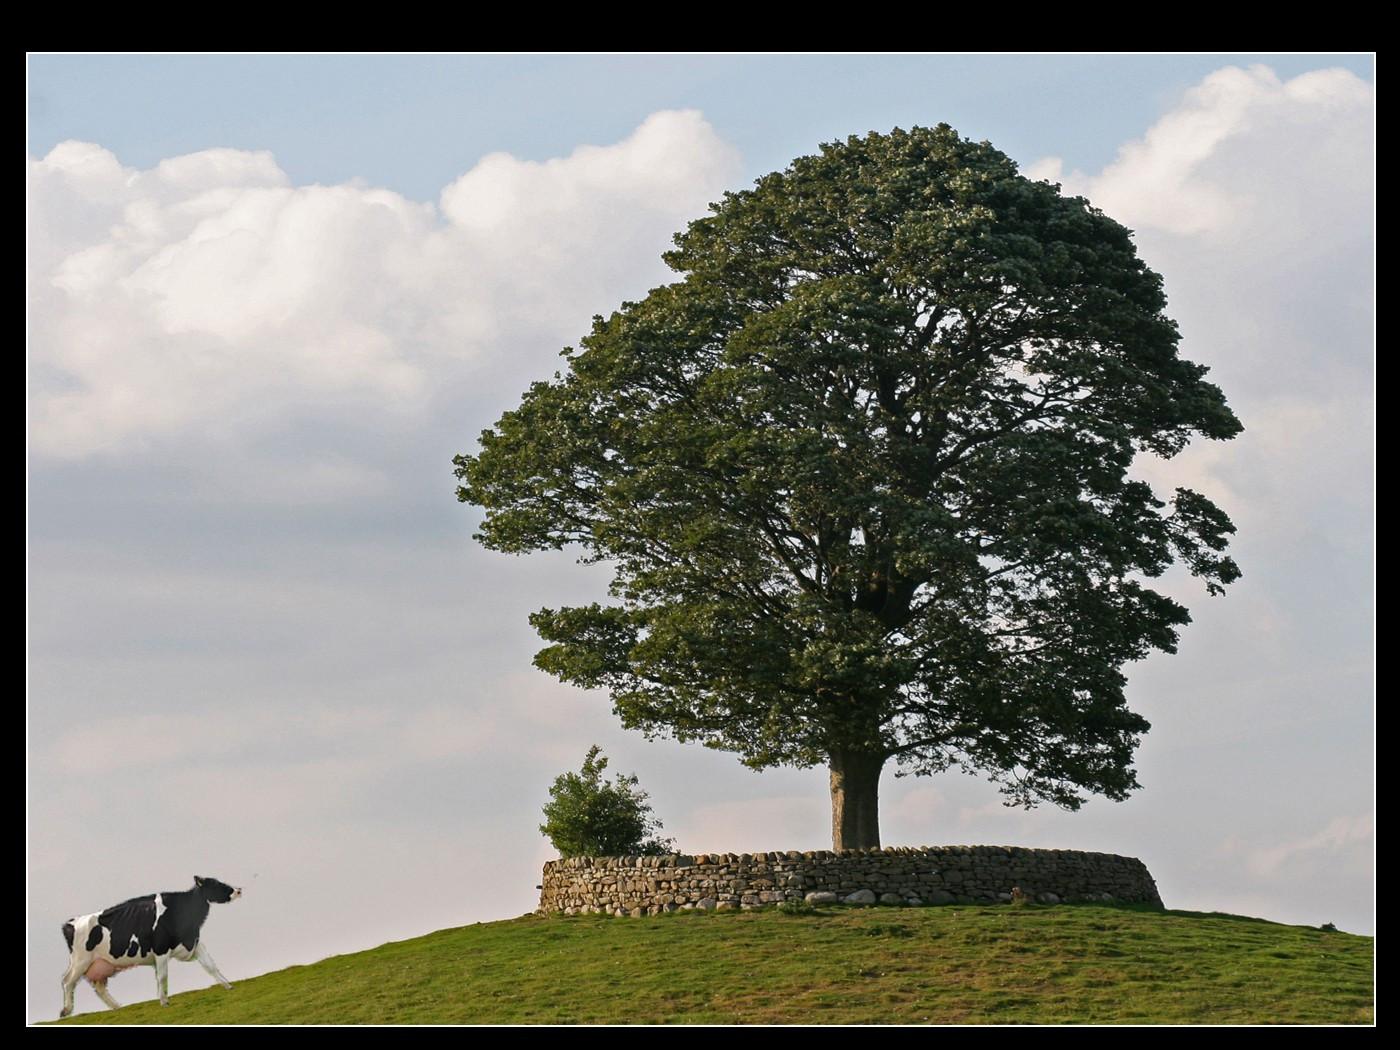 16. The Tree